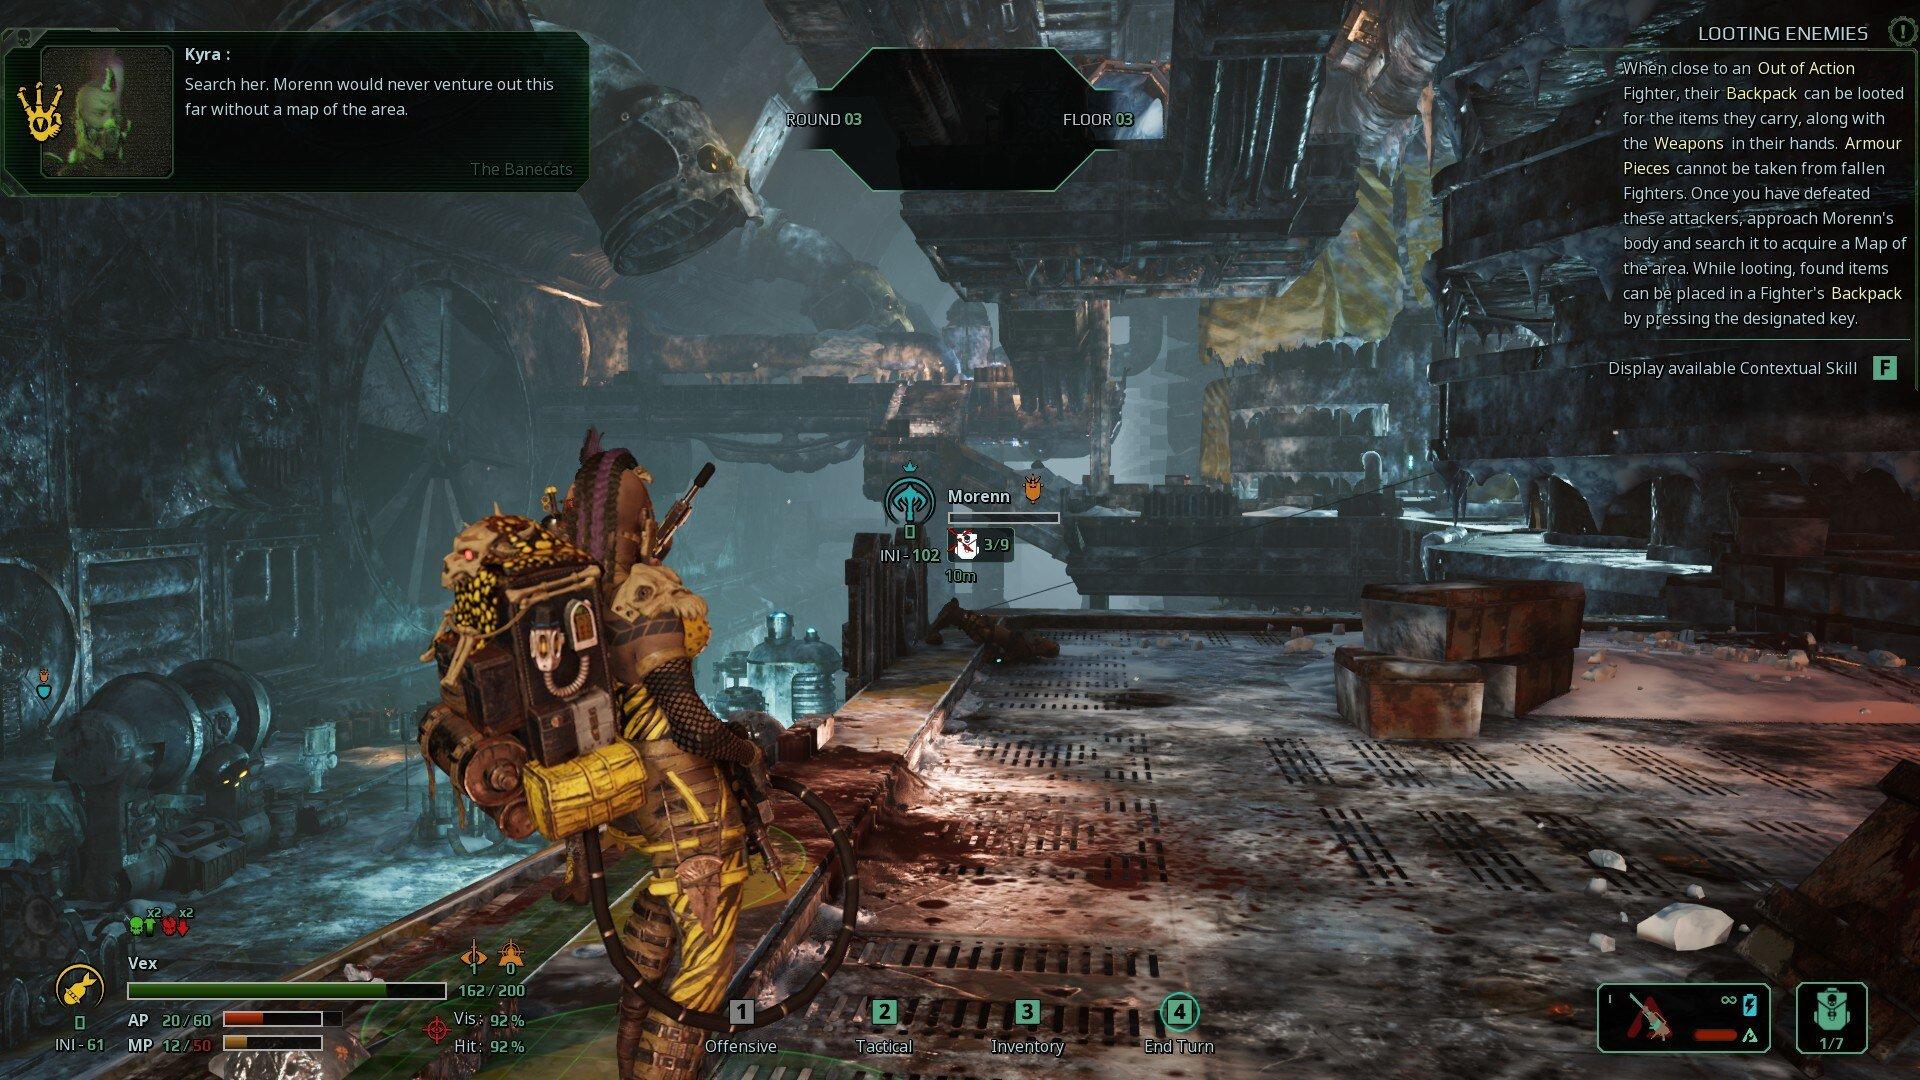 Screenshot for the game Necromunda: Underhive Wars (2020) скачать торрент RePack